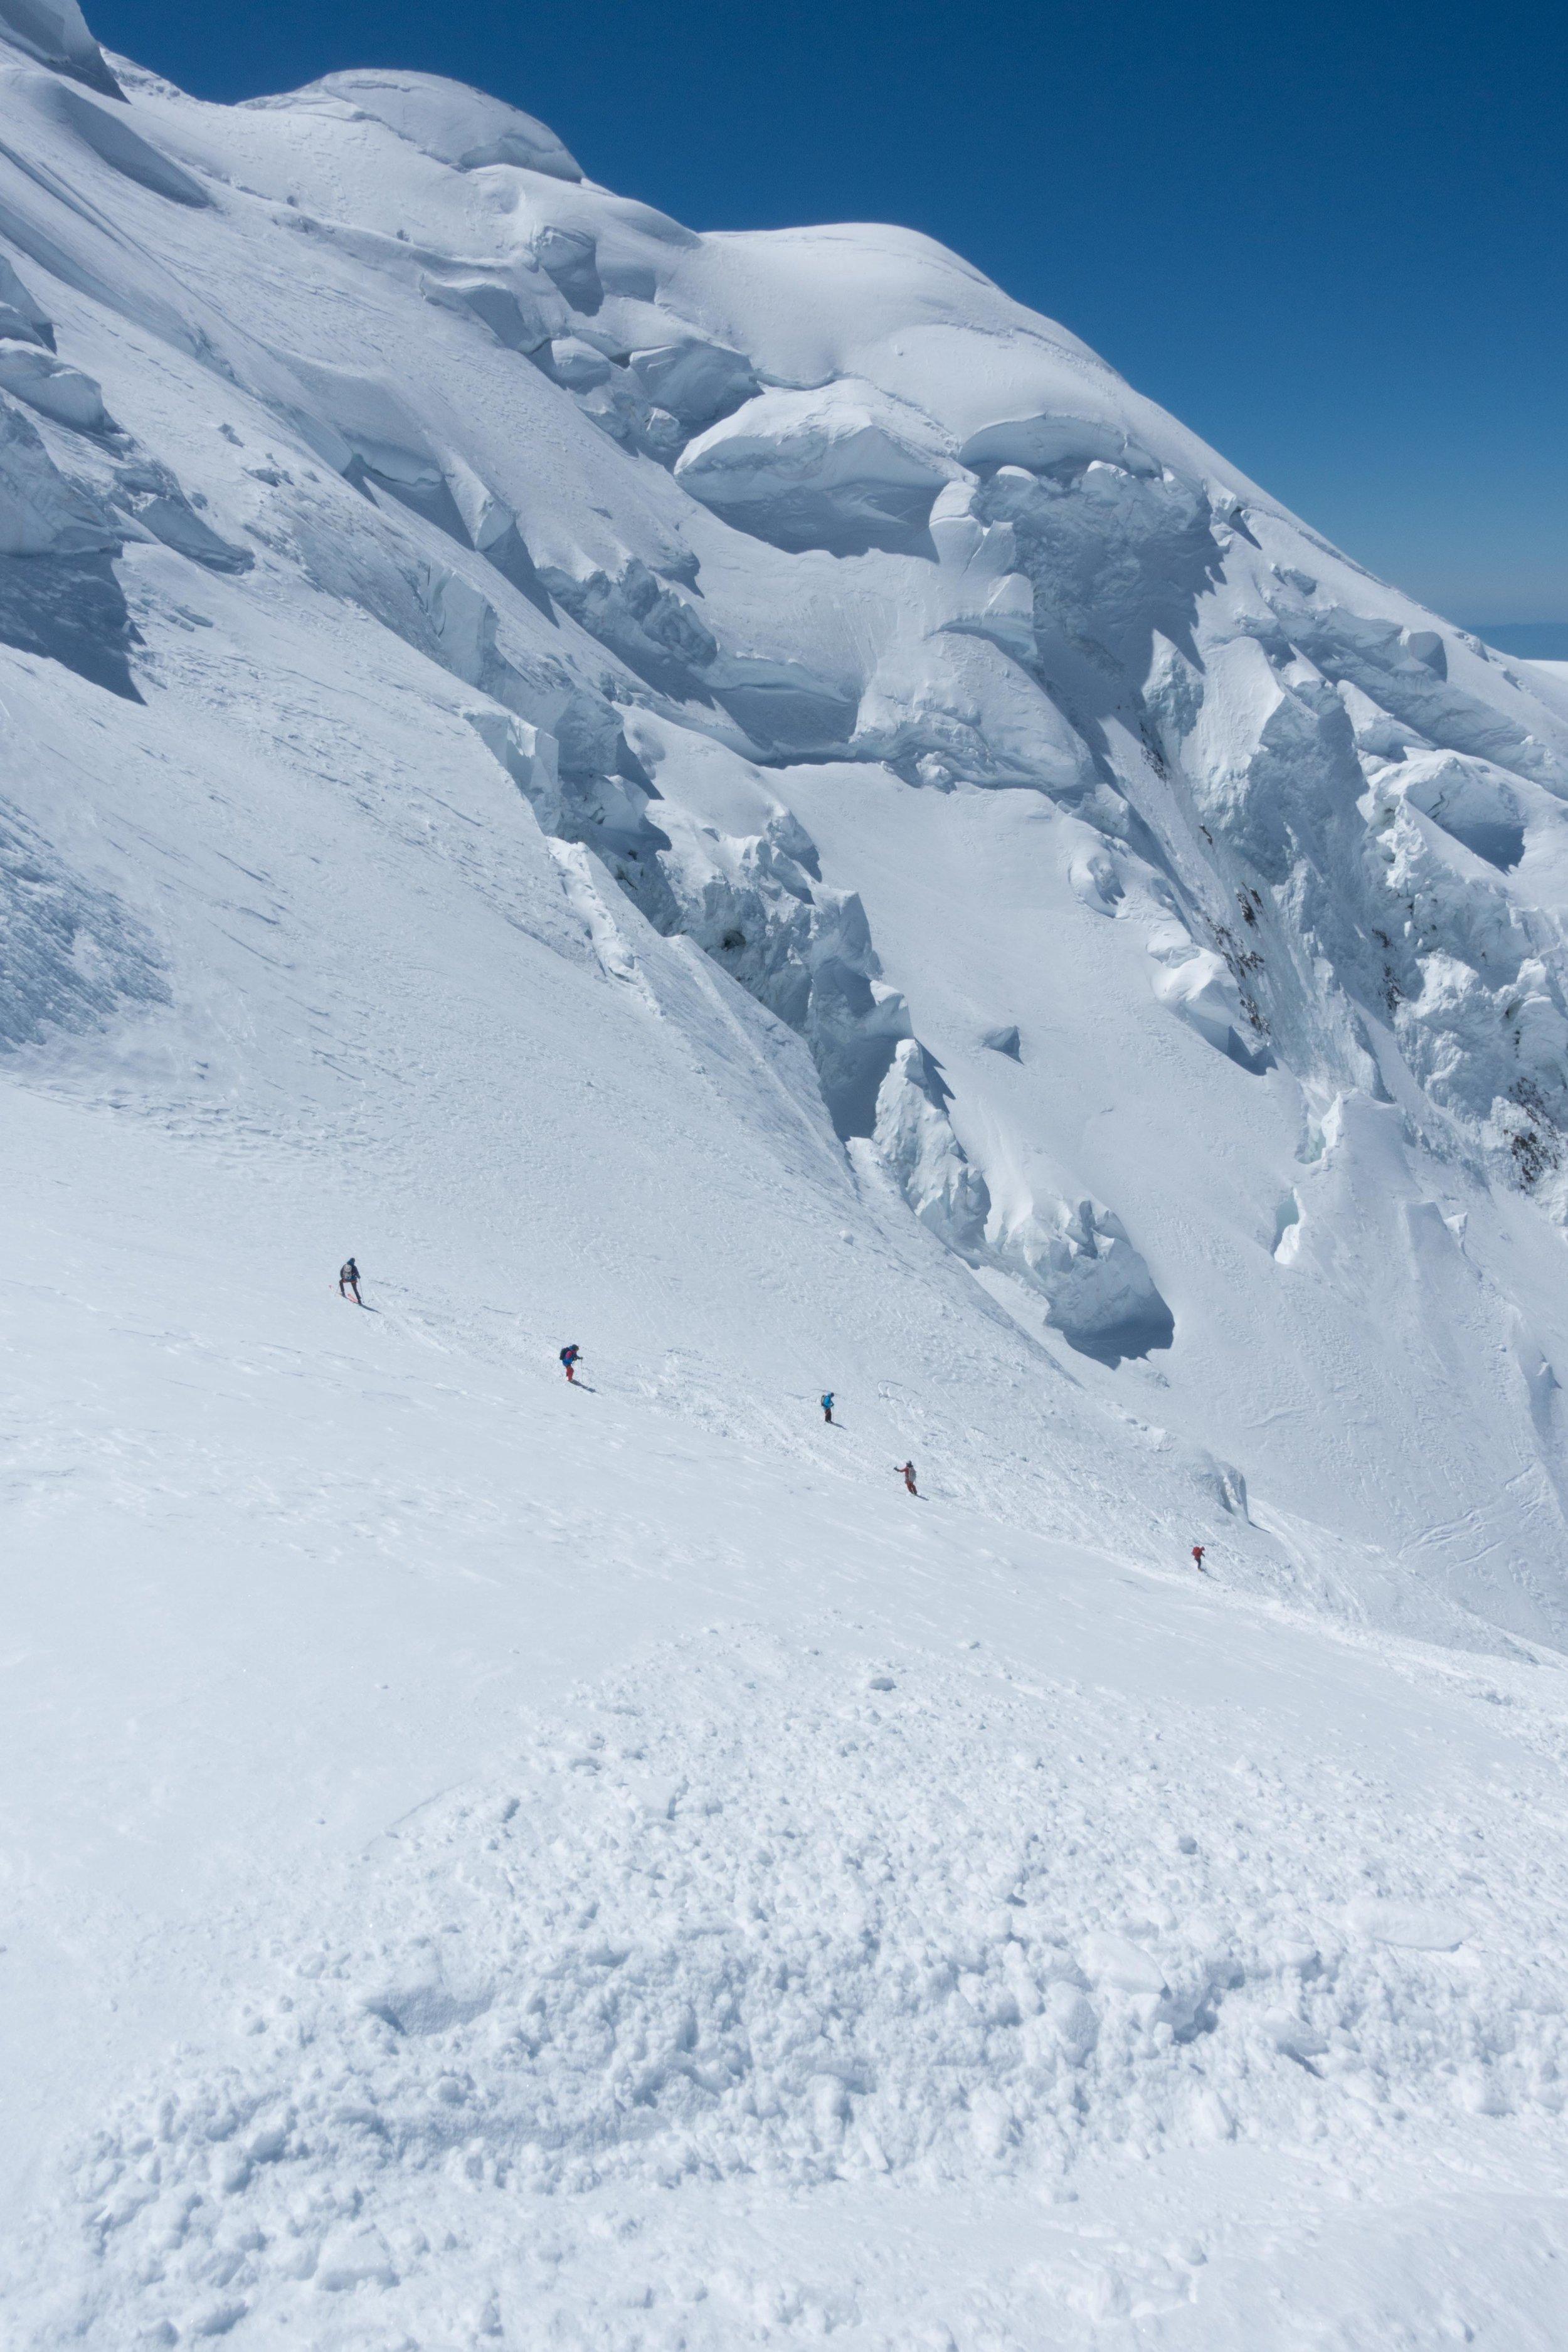 Chamonix_Ski.jpg